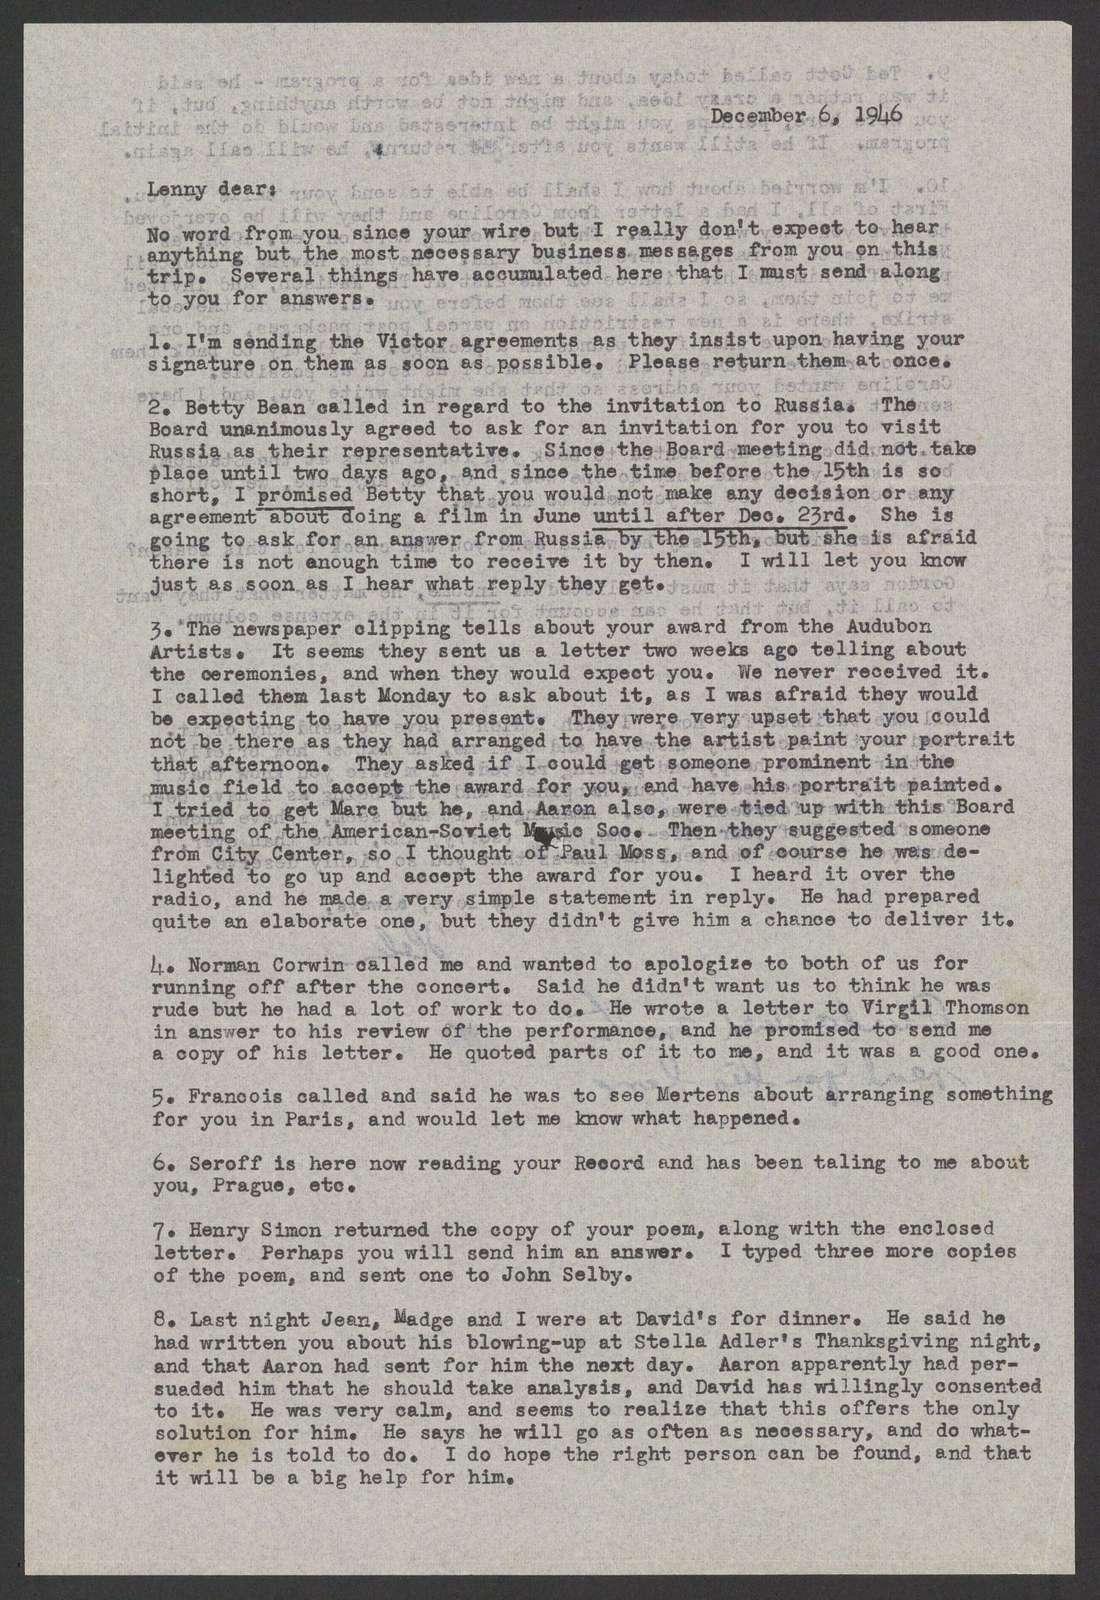 Helen Coates to Leonard Bernstein, December 6, 1946